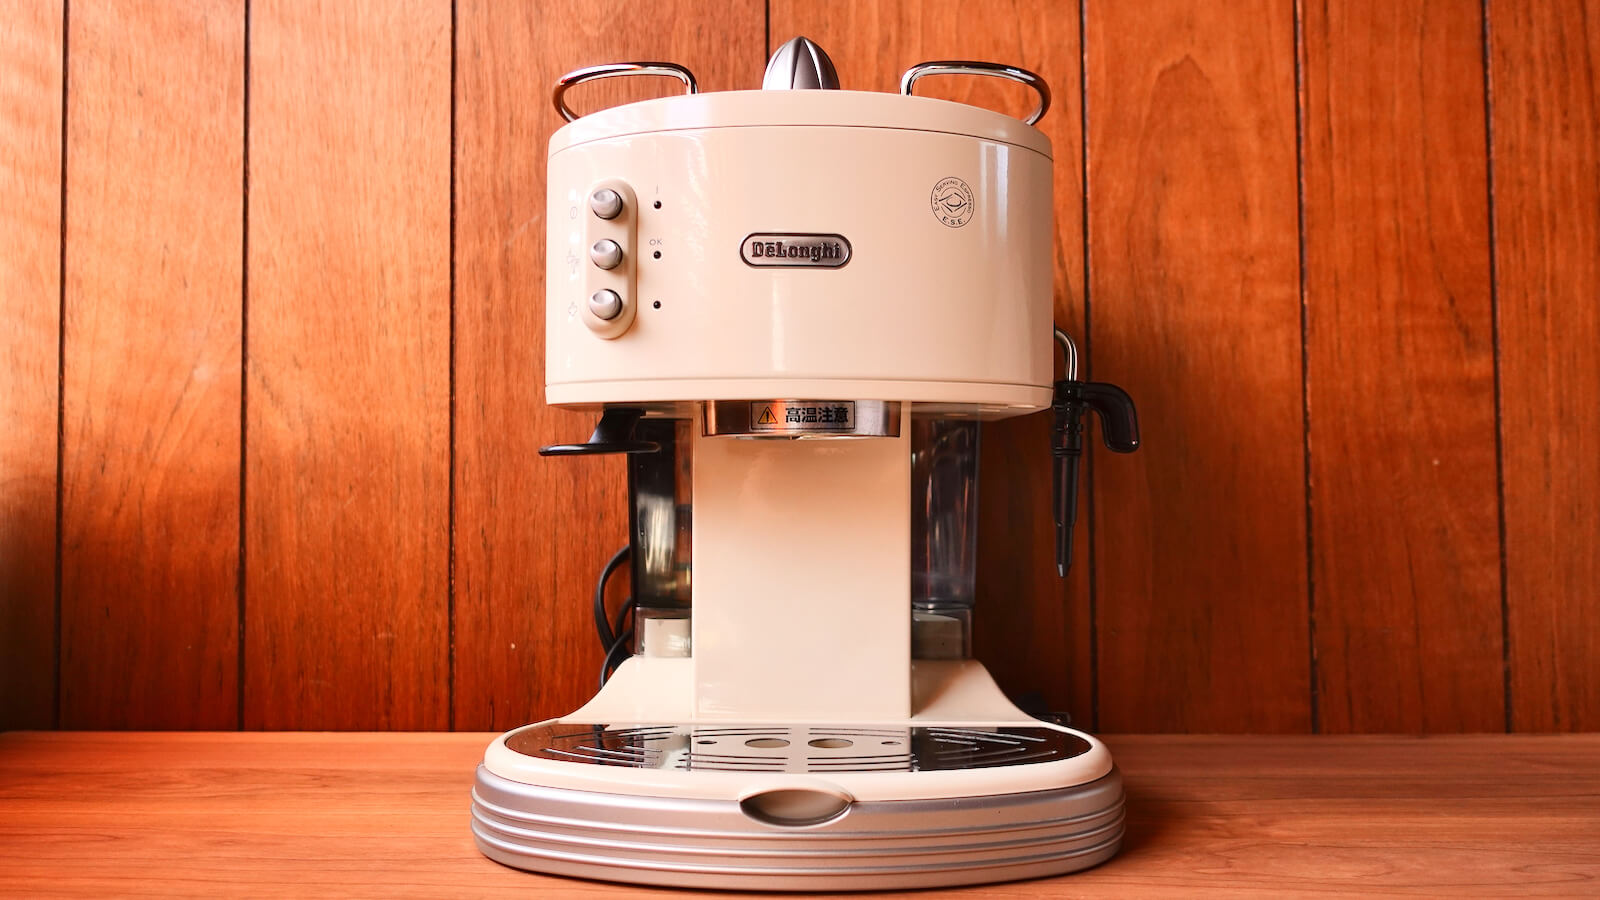 Front view of Delonghi espresso machine ECM300J